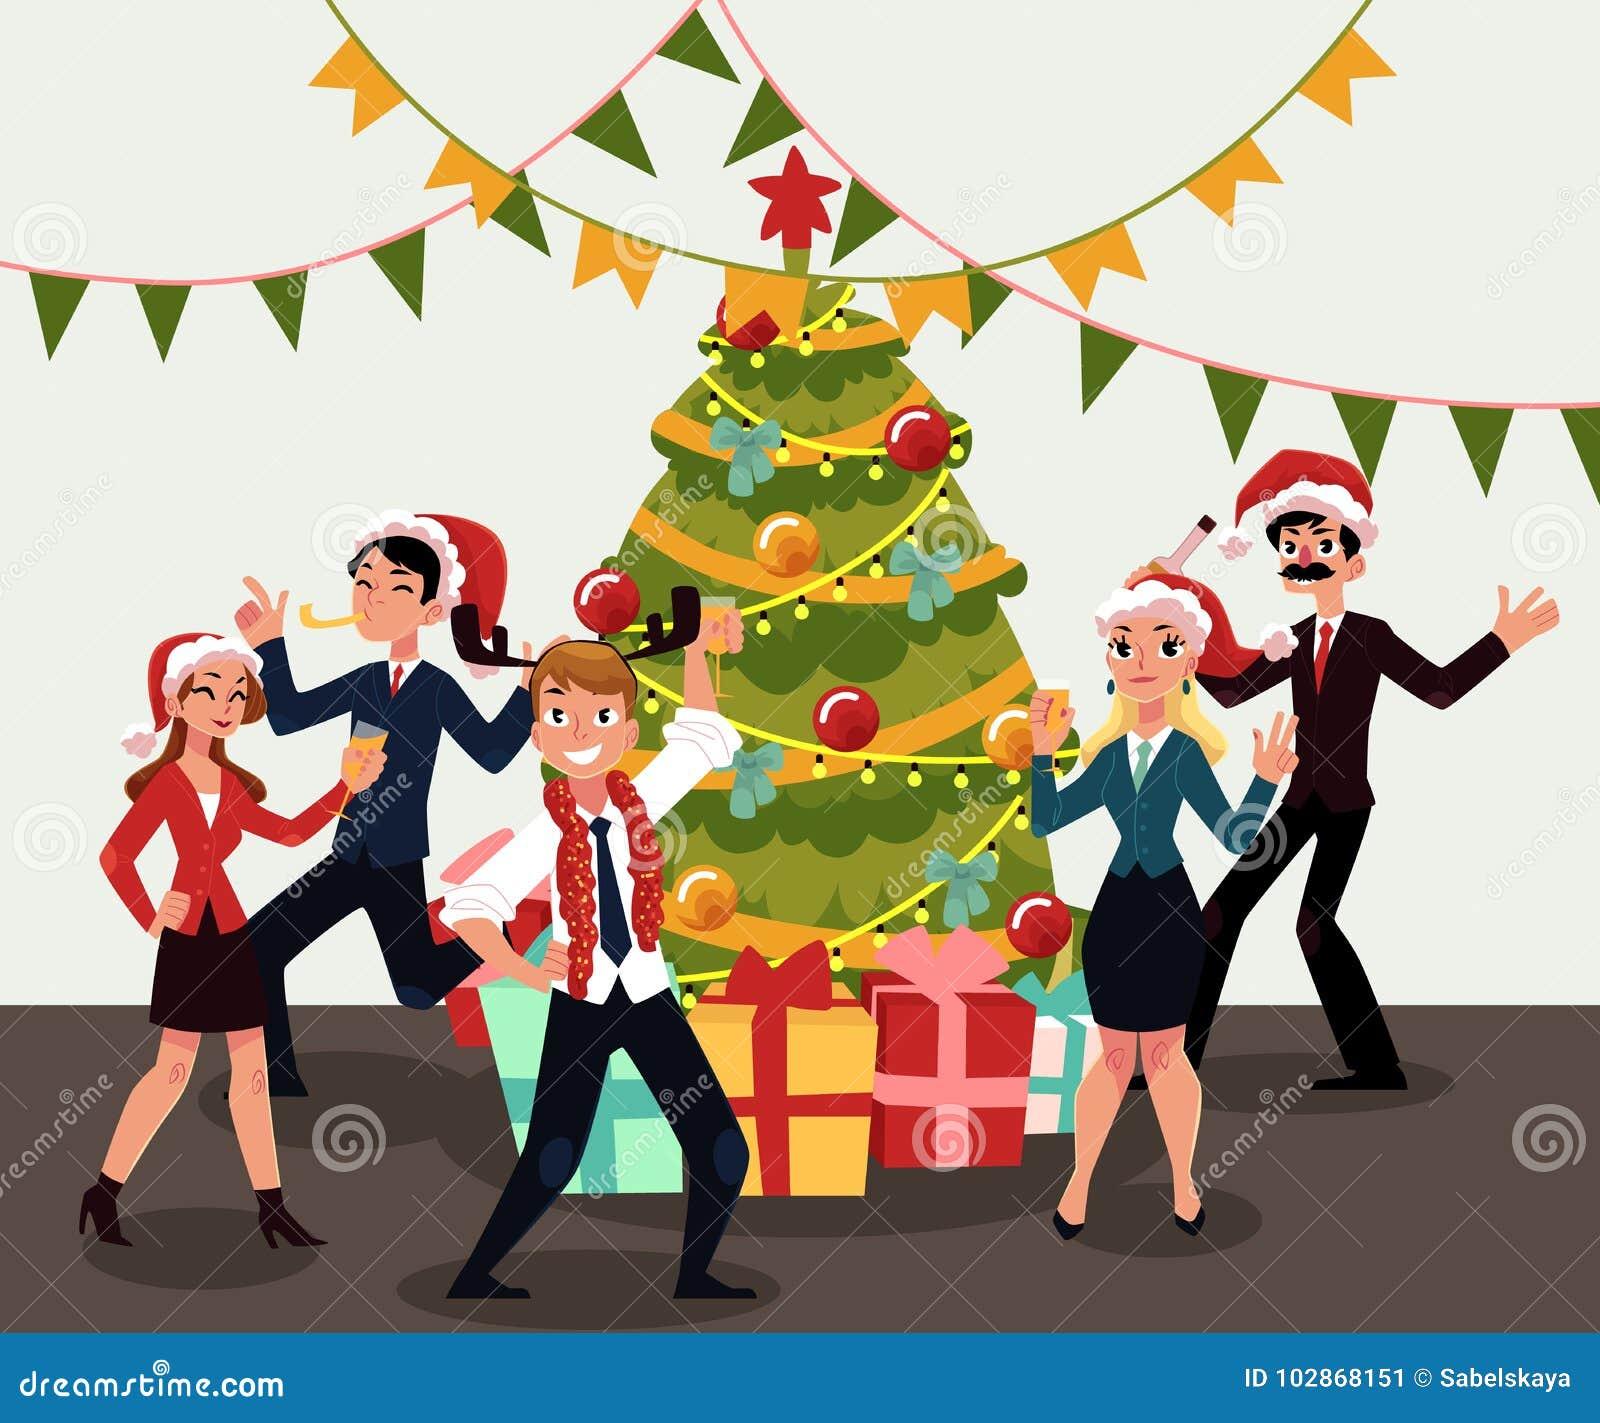 Christmas Celebration Cartoon Images.Happy People Having Corporate Xmas Party Celebrating